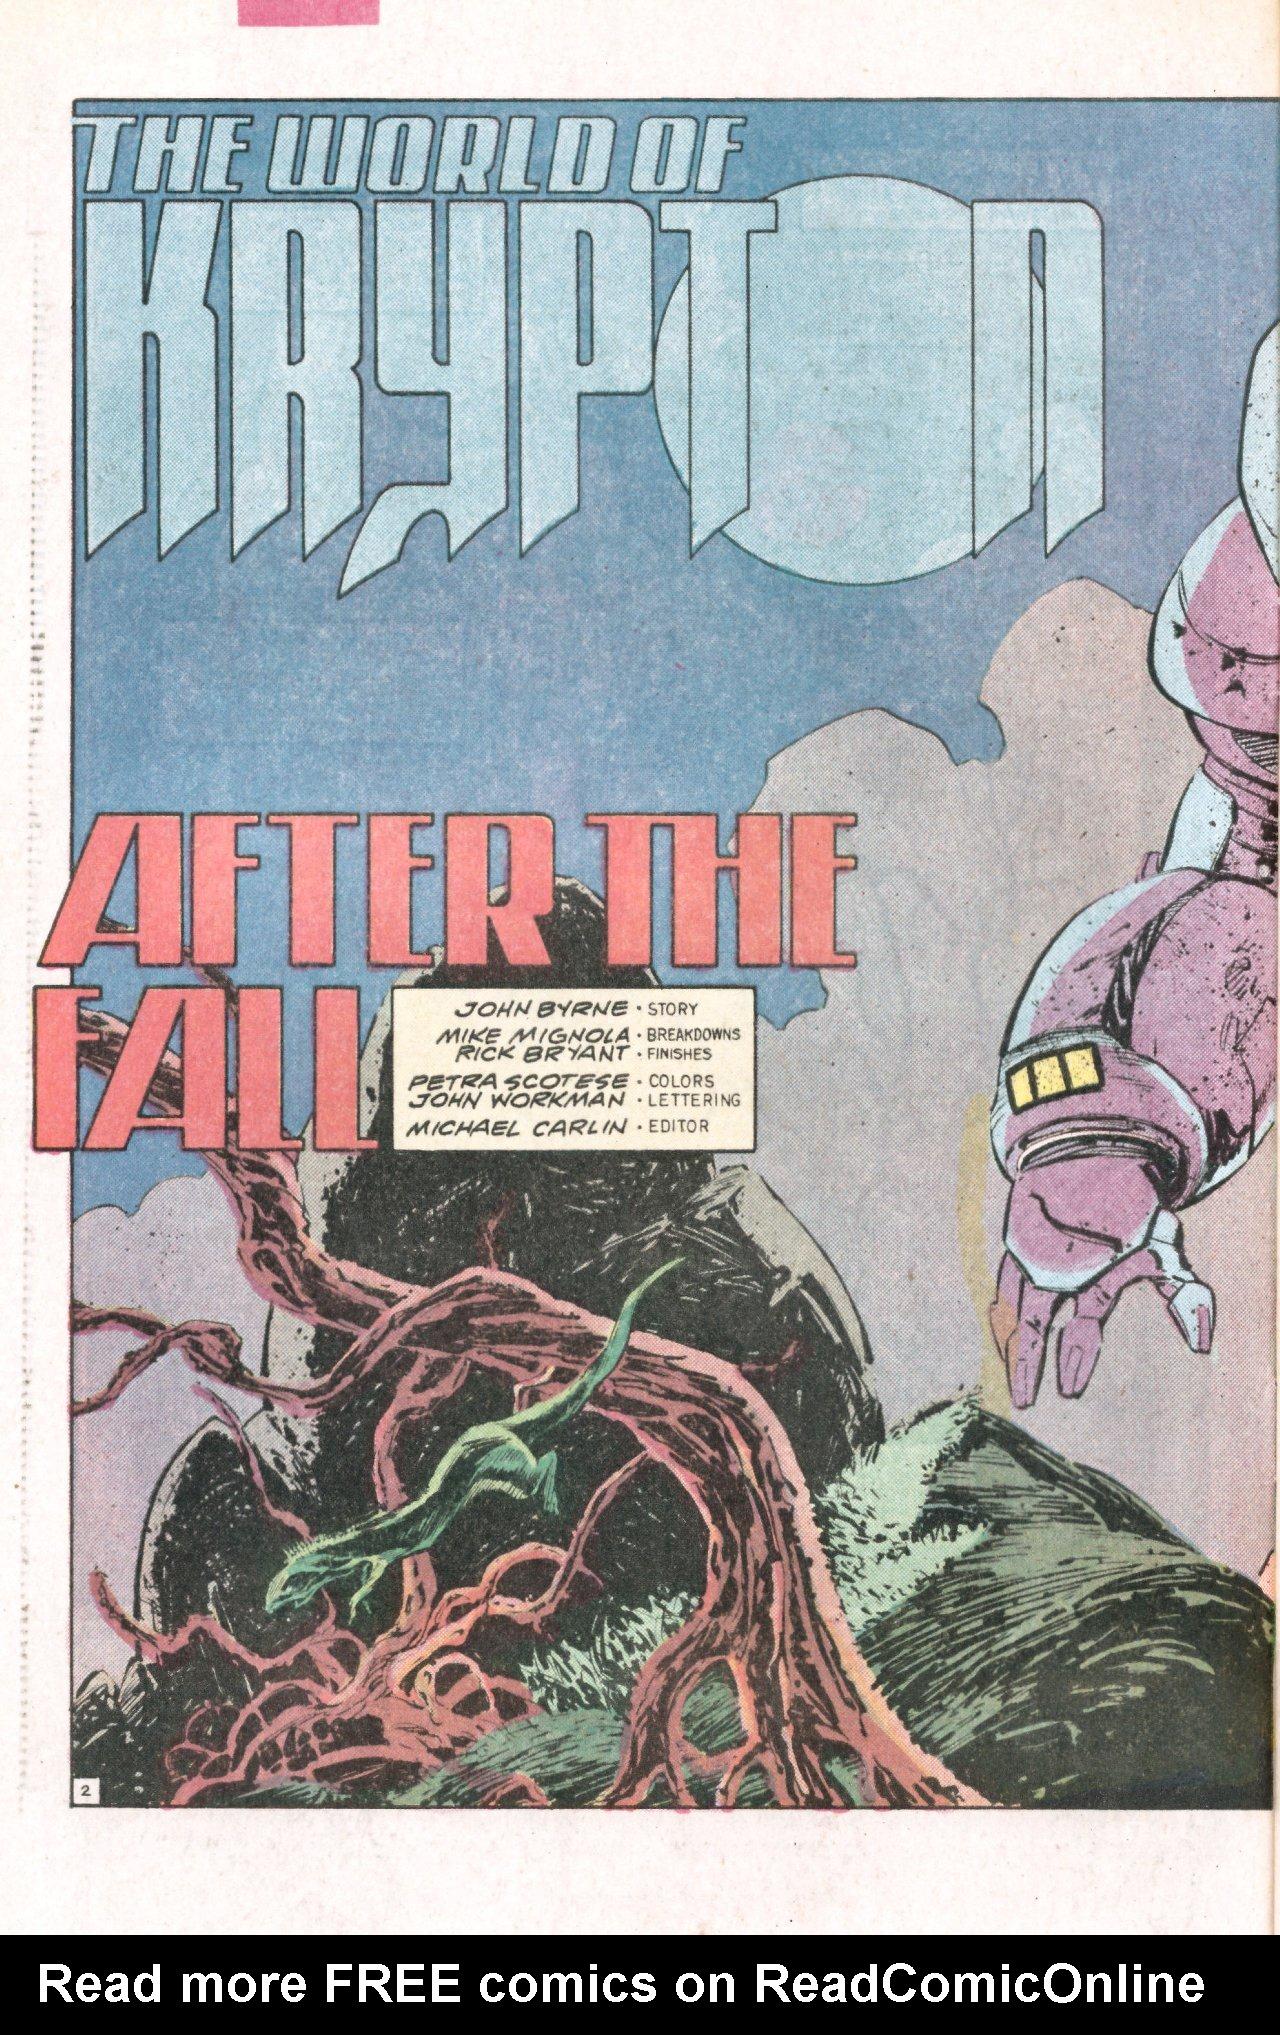 Read online World of Krypton comic -  Issue #2 - 5